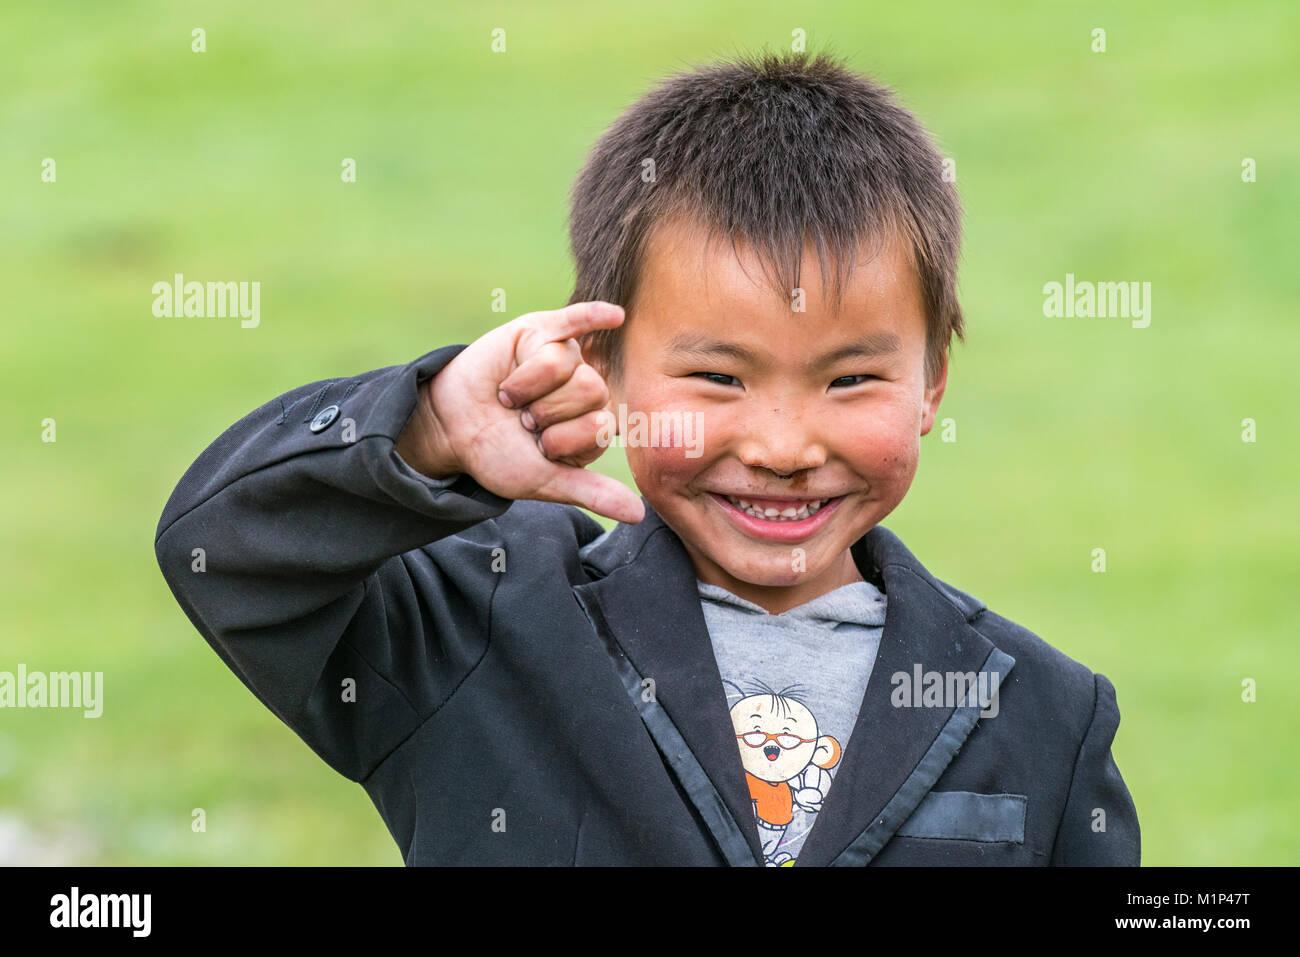 Retrato de un niño nómada mongol, provincia Hangay del Norte, Mongolia, Asia Central, África Imagen De Stock